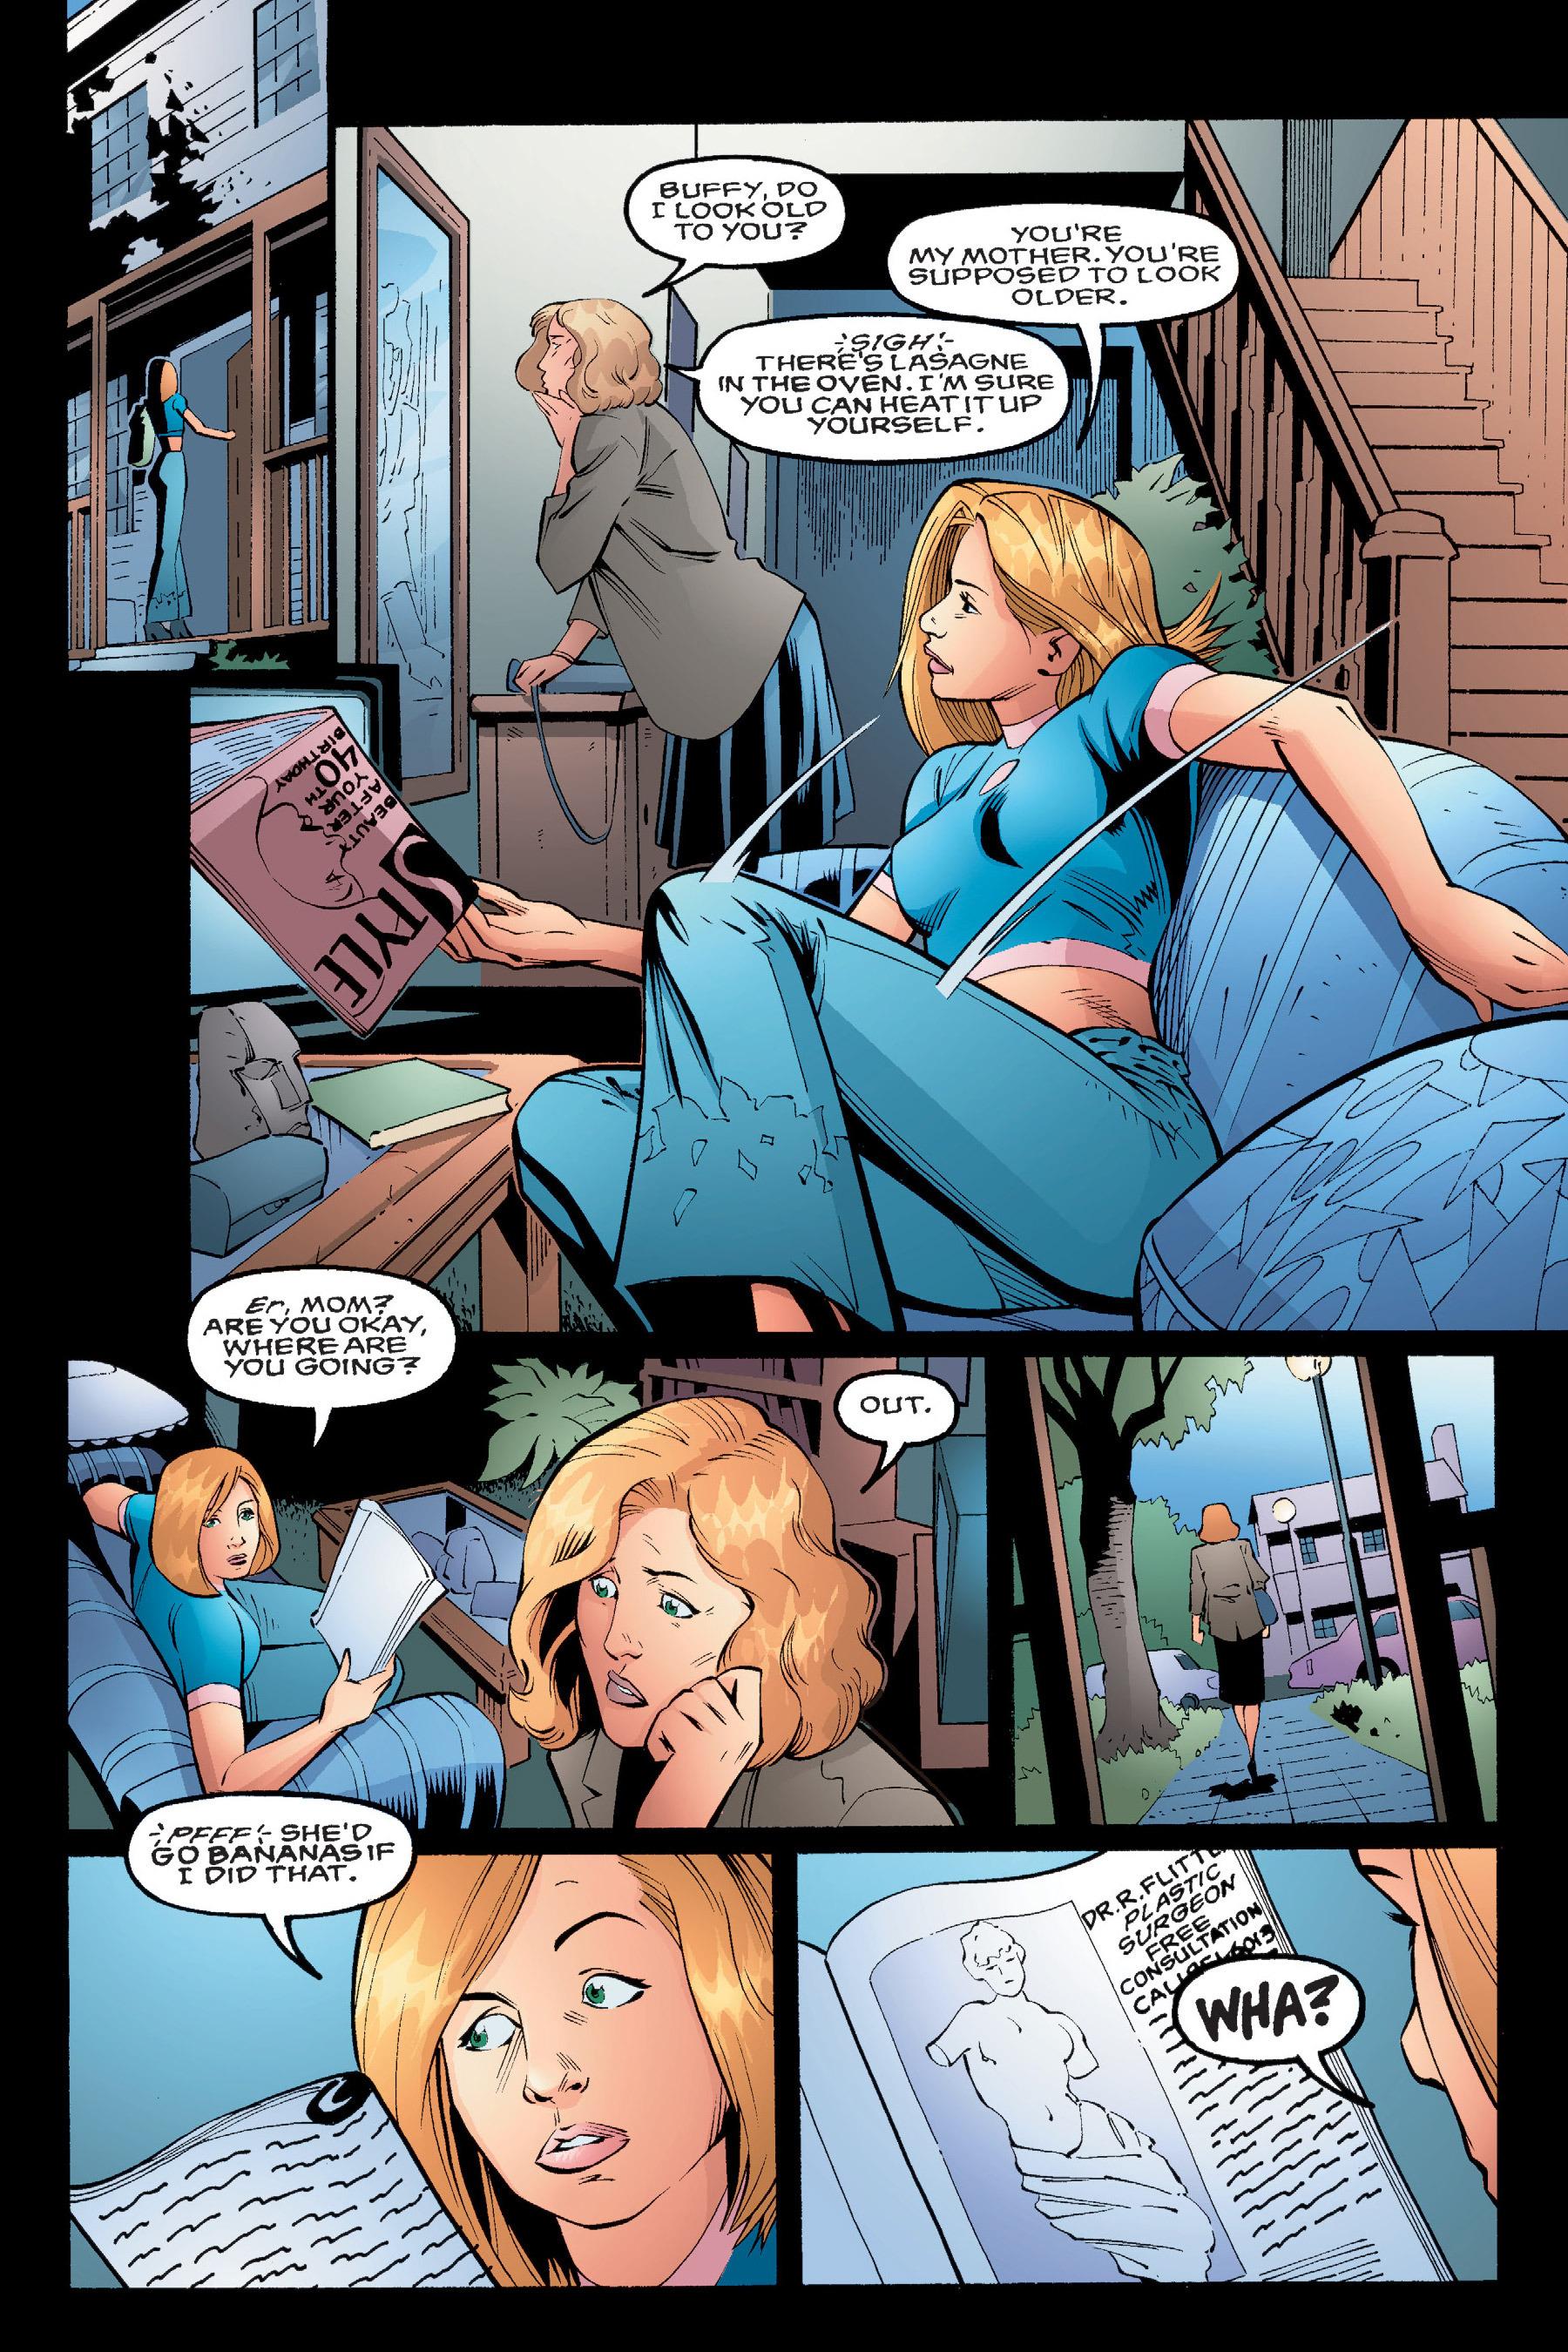 Read online Buffy the Vampire Slayer: Omnibus comic -  Issue # TPB 4 - 15